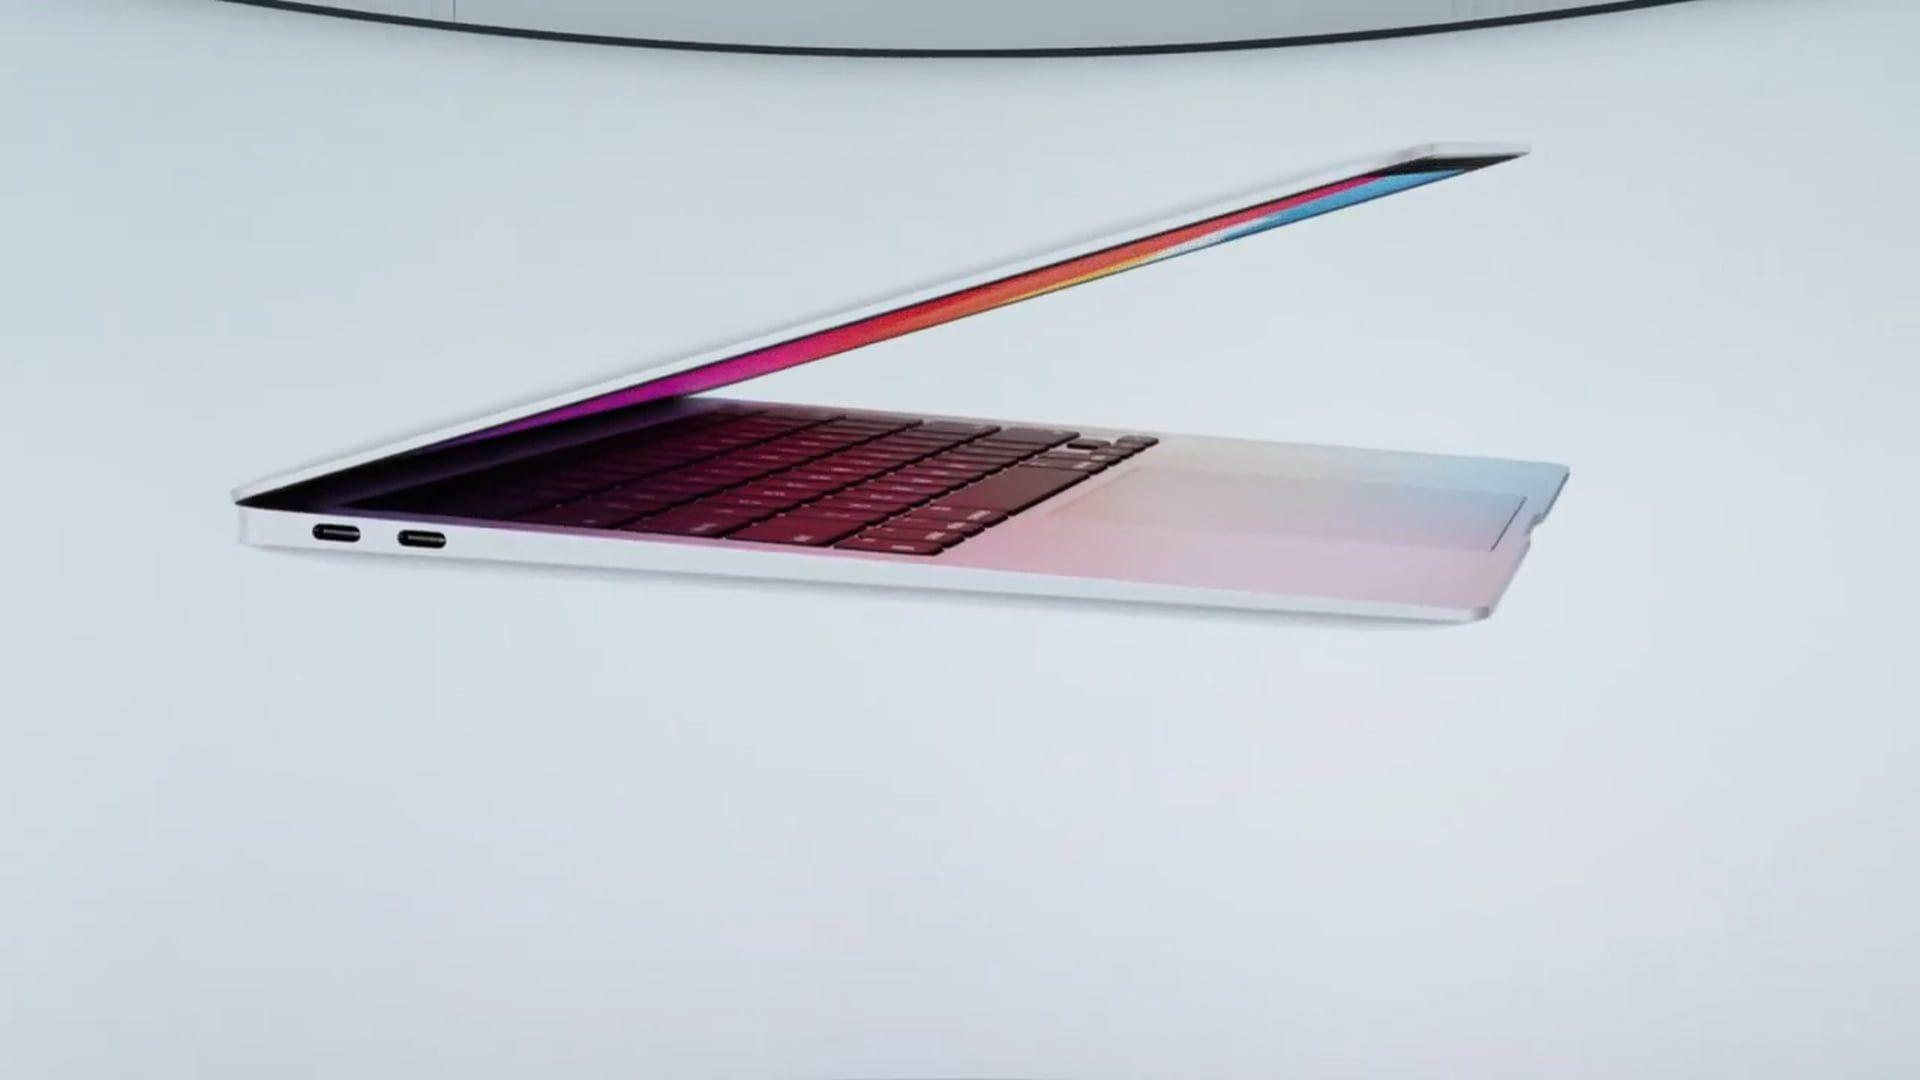 Firma Apple pokazała nowy model komputera MacBook Air